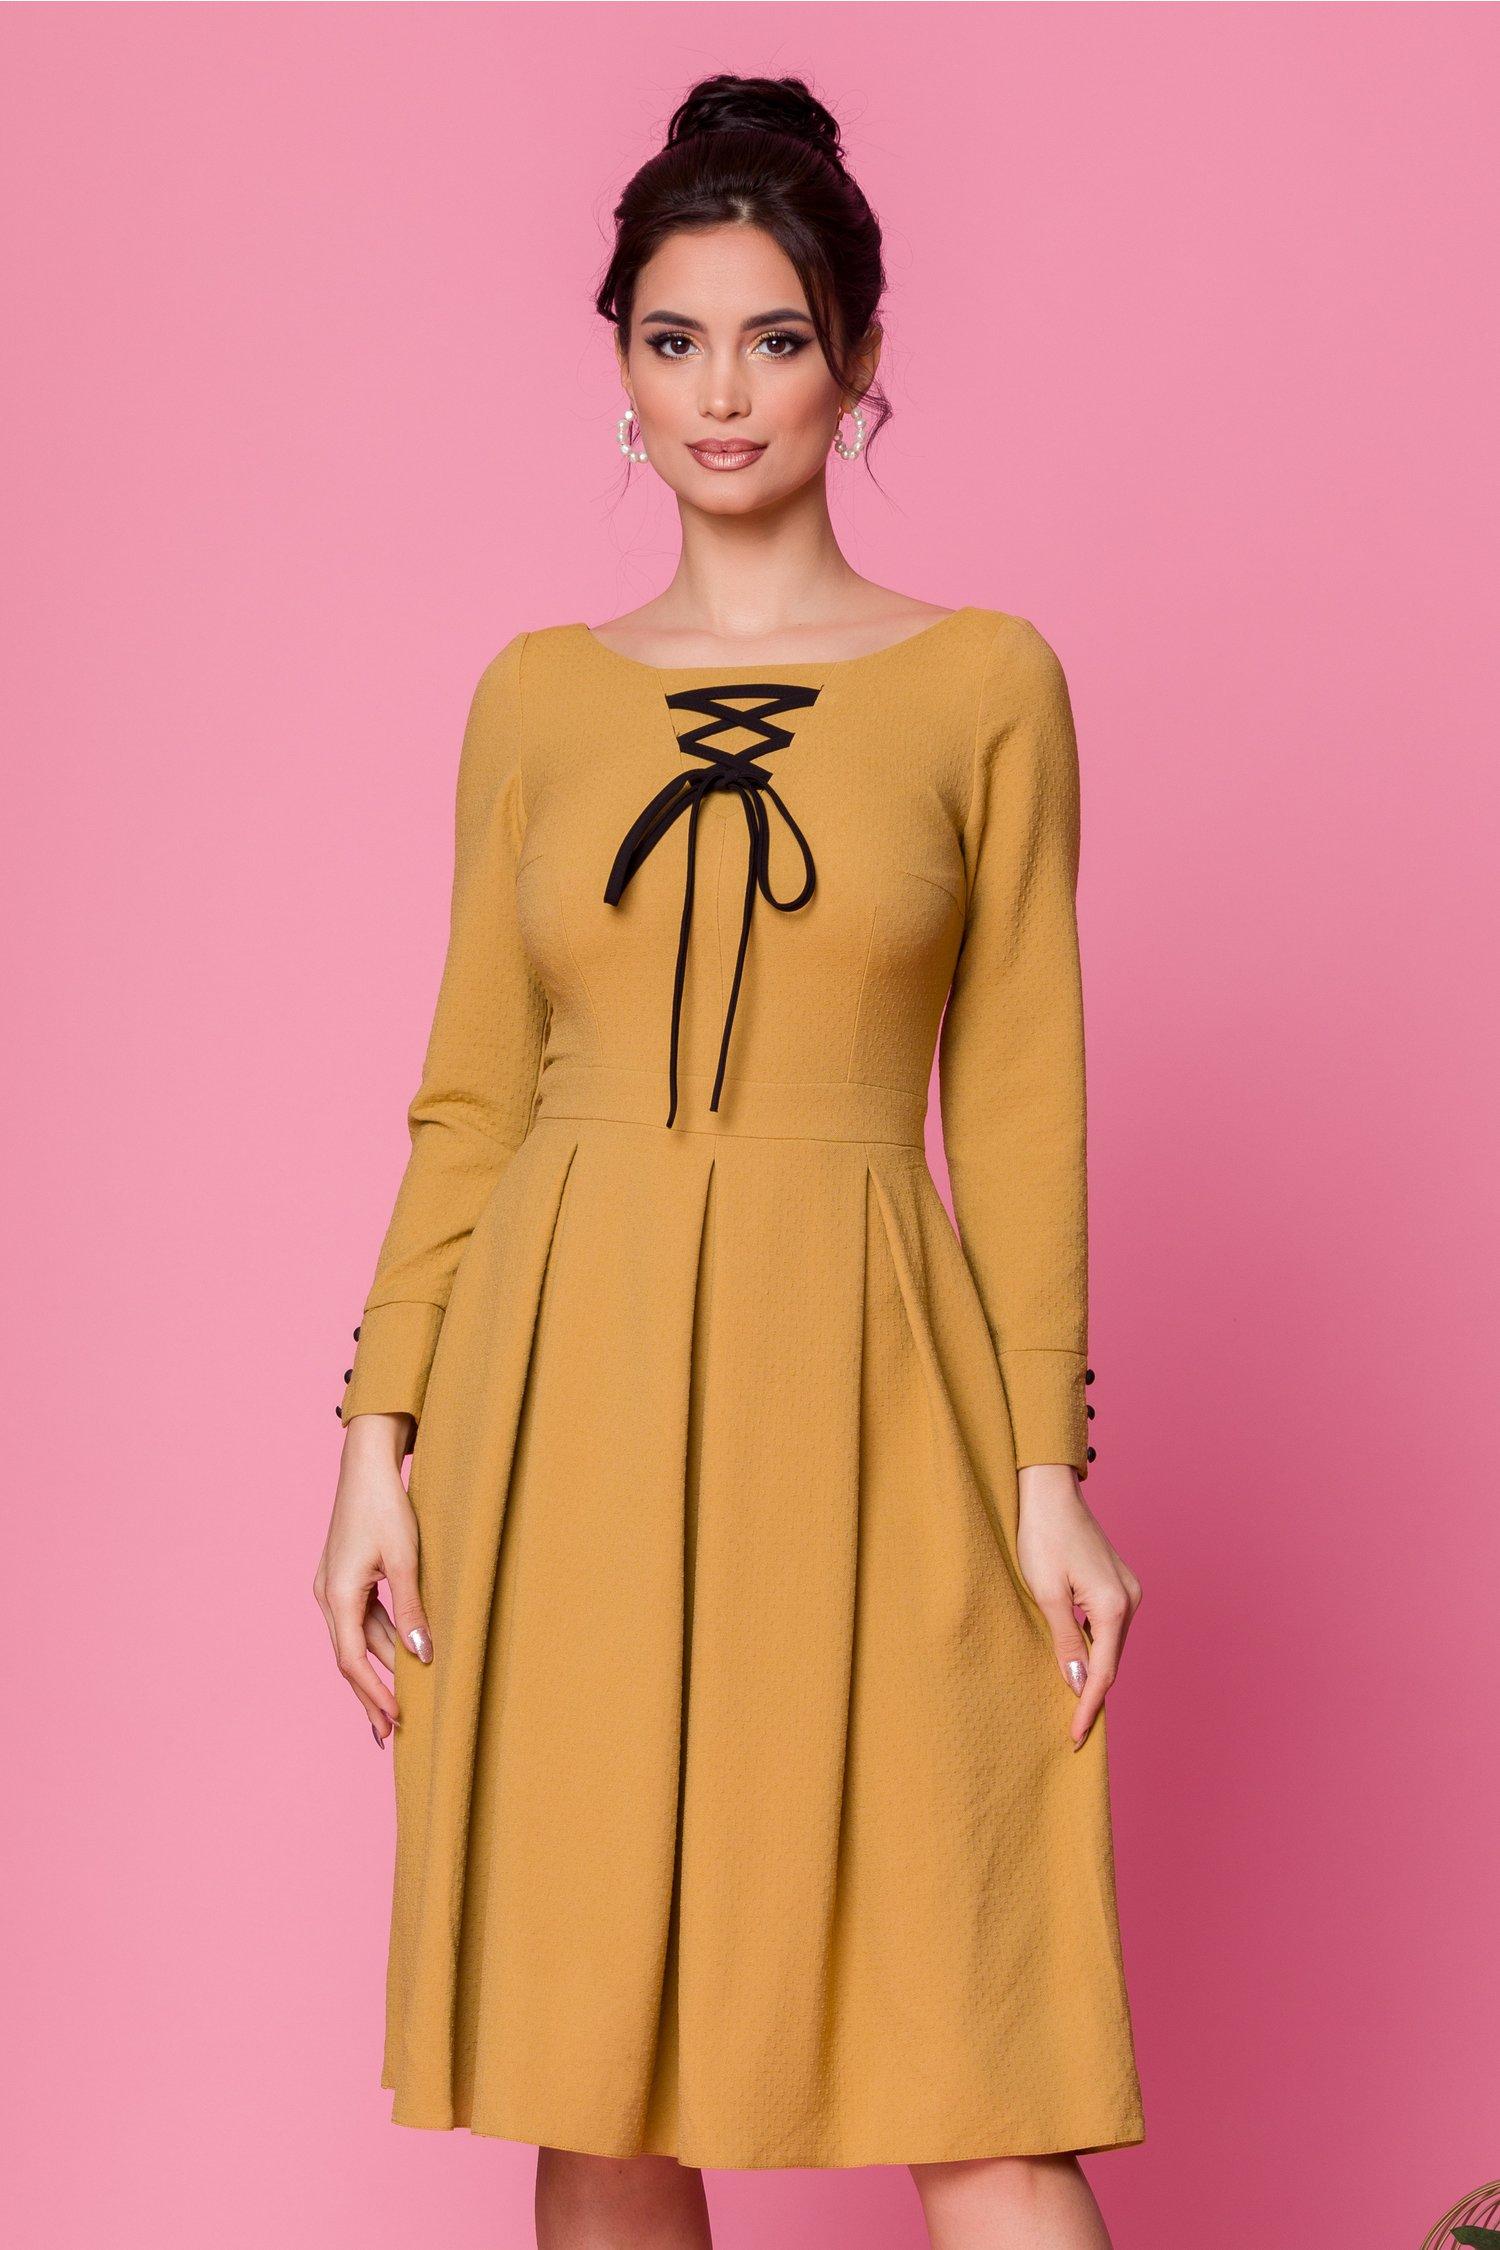 rochie moze galben mustar clos cu snur negru la decolteu 481158 4